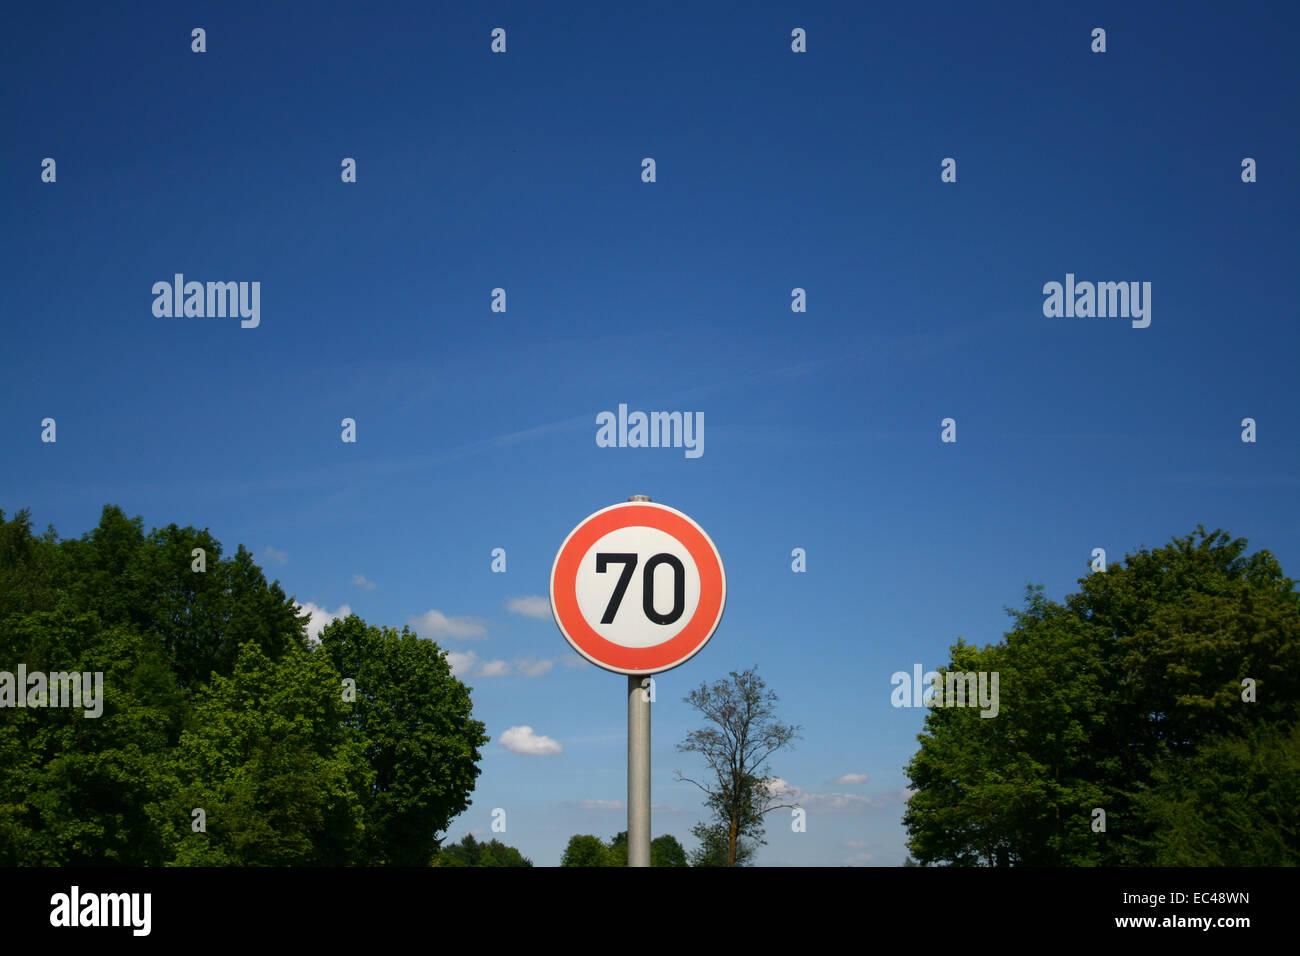 traffic regulation - Stock Image